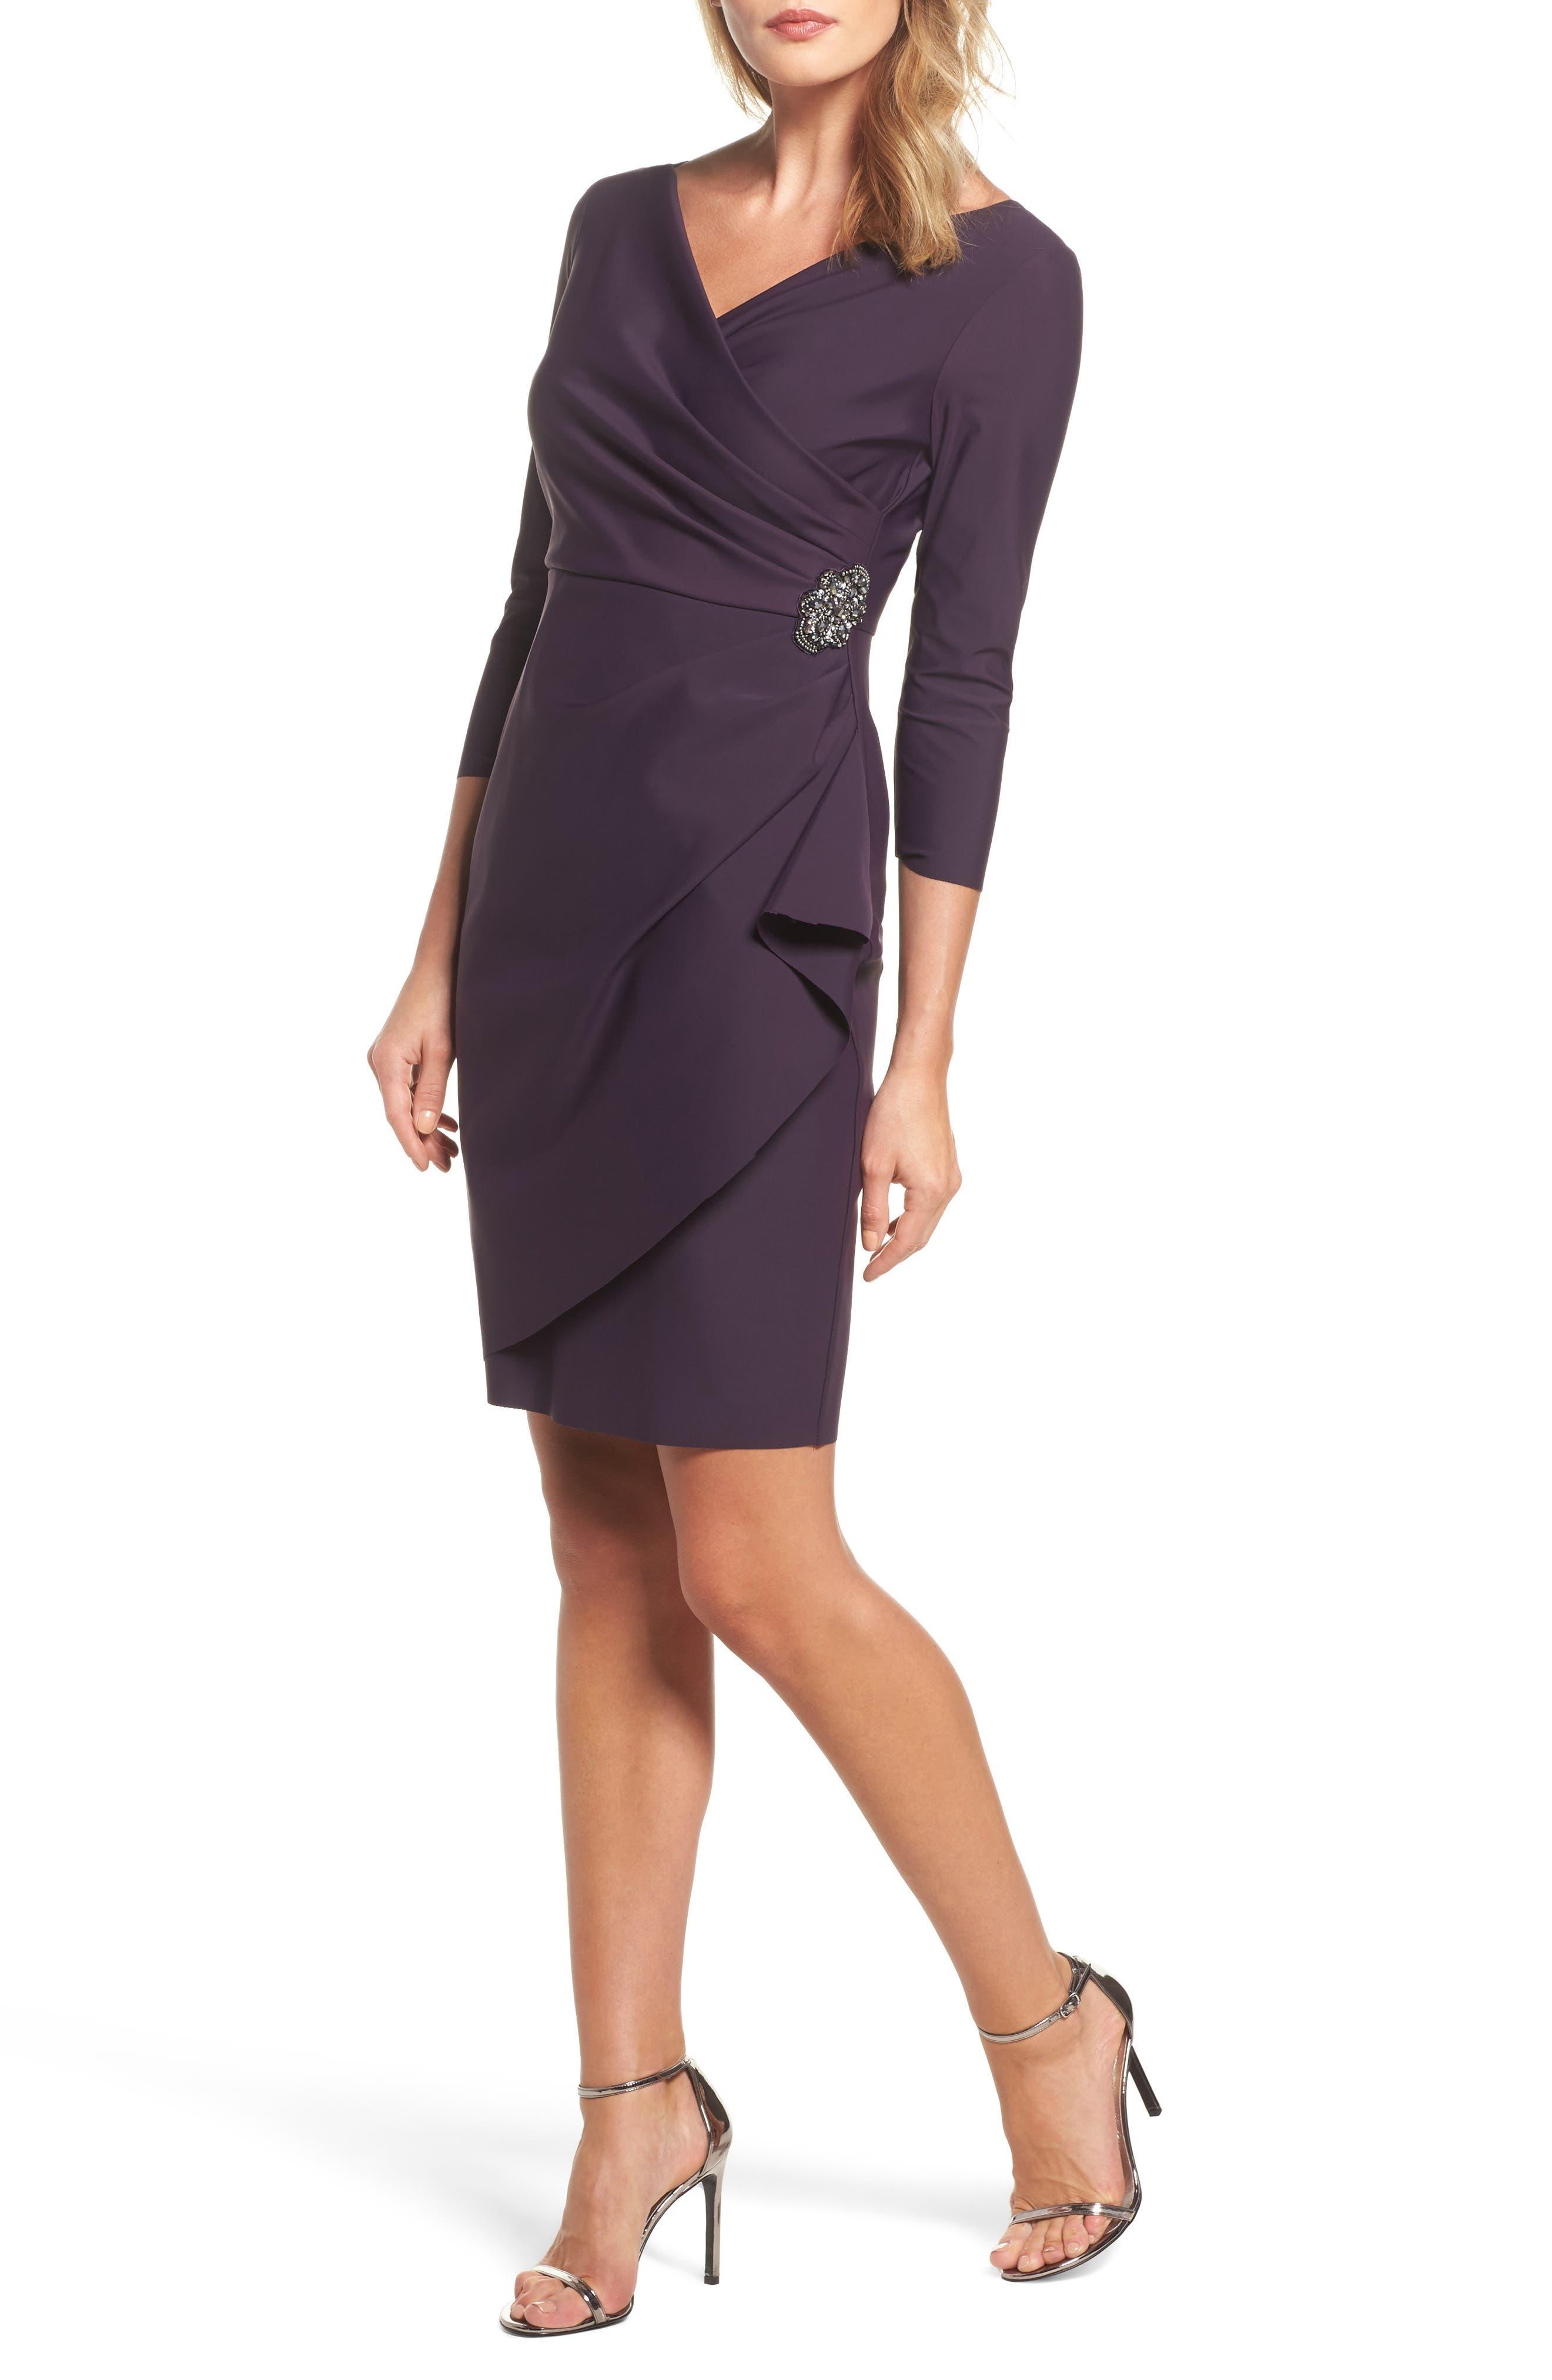 Alternate Image 1 Selected - Alex Evenings Embellished Ruched Sheath Dress (Regular & Petite)